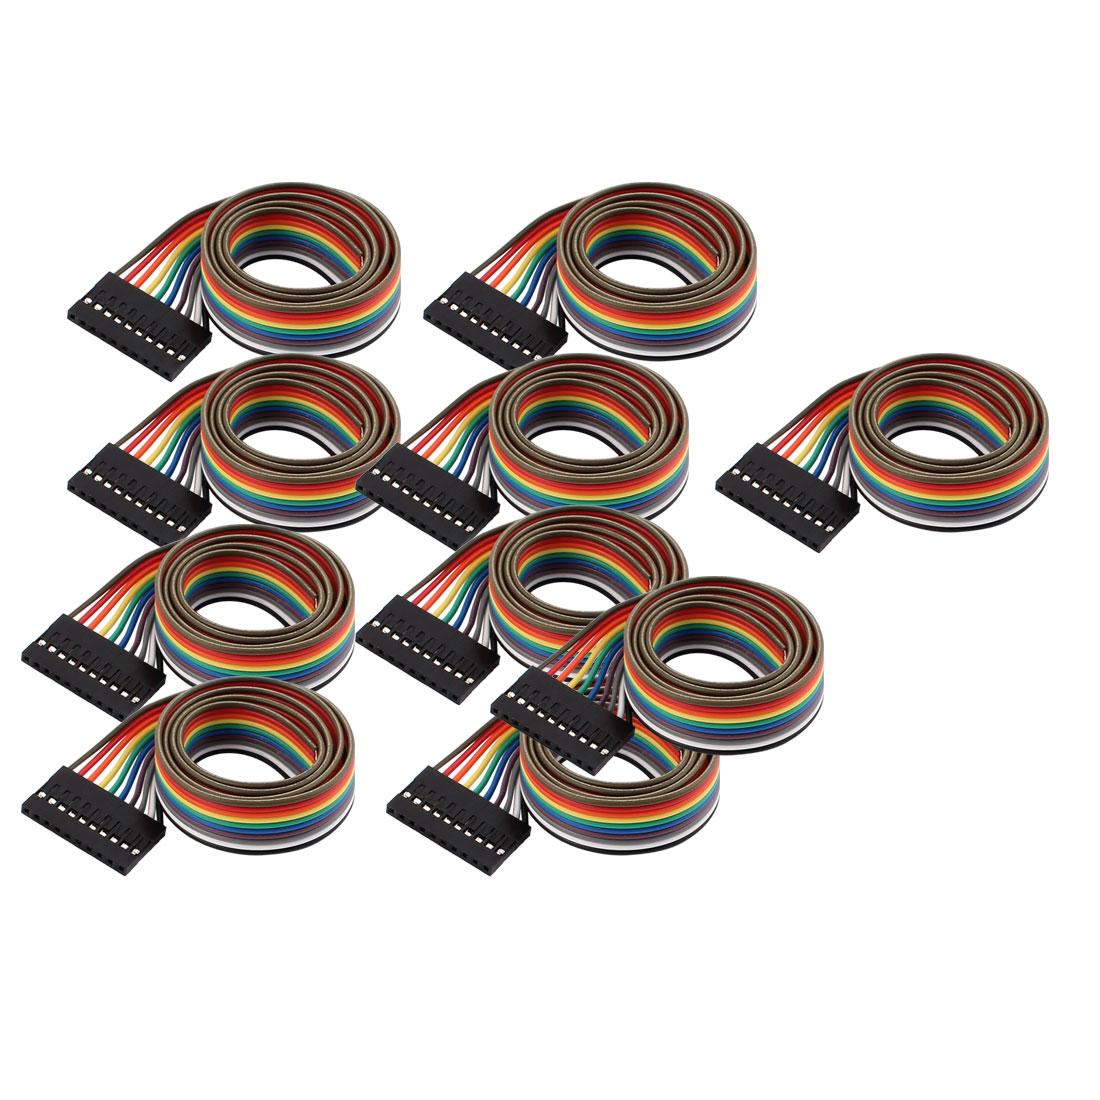 10 Pcs 10P Jumper Wires Female Ribbon Cables Pi Pic Breadboard DIY 50cm Long